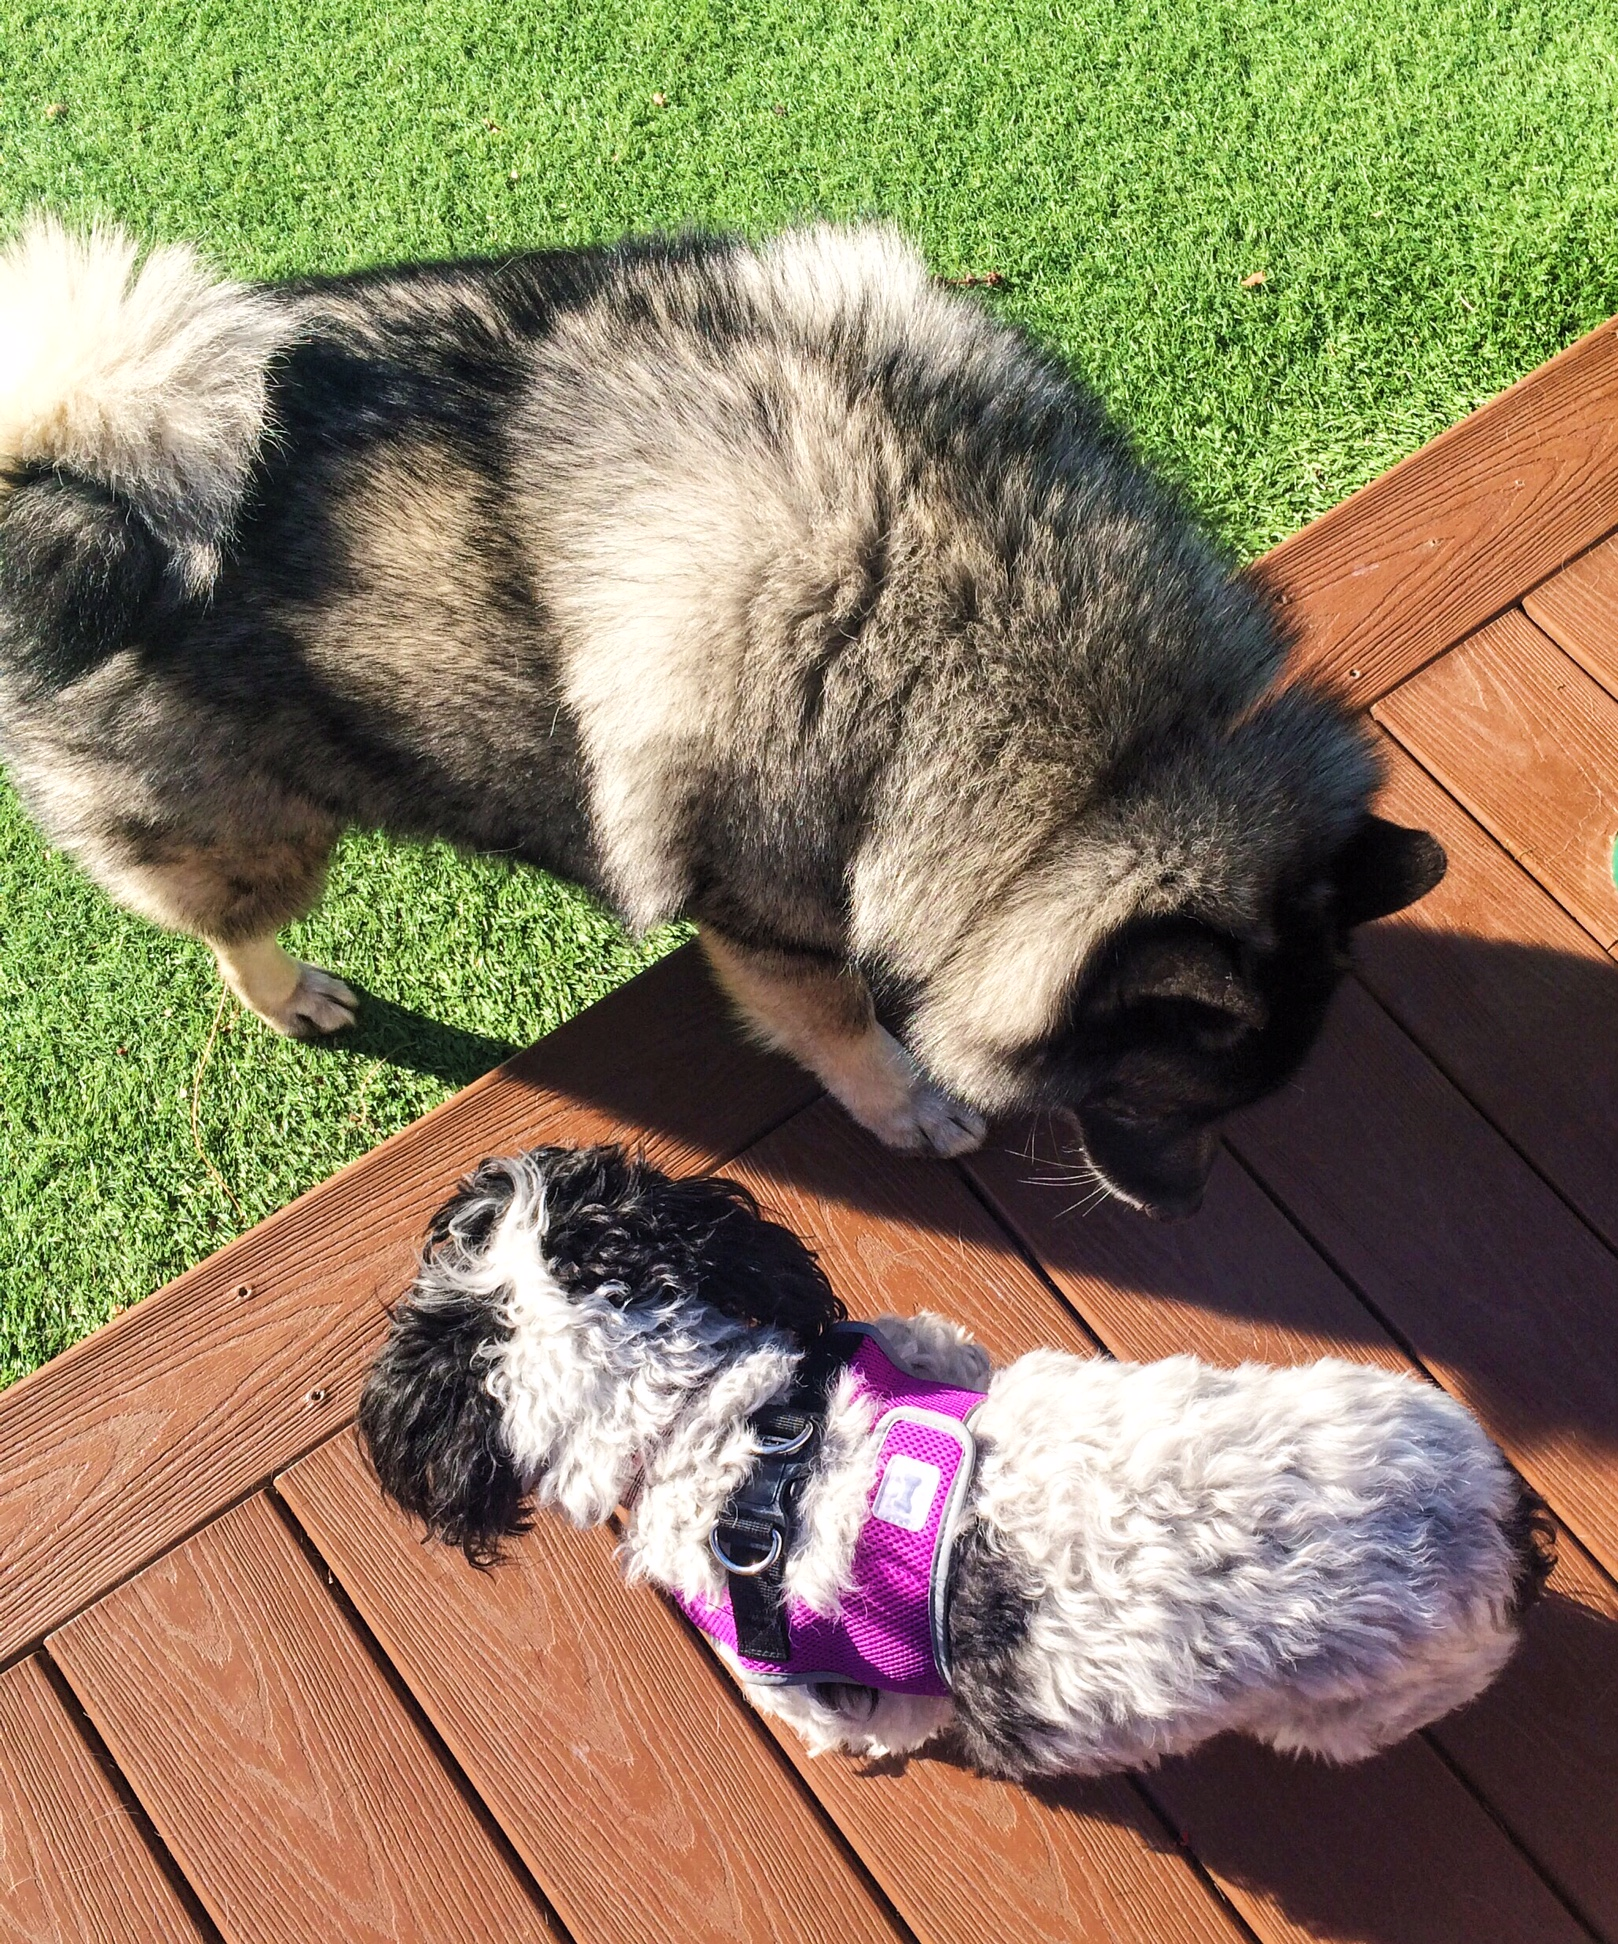 Cloe and fluffy dog